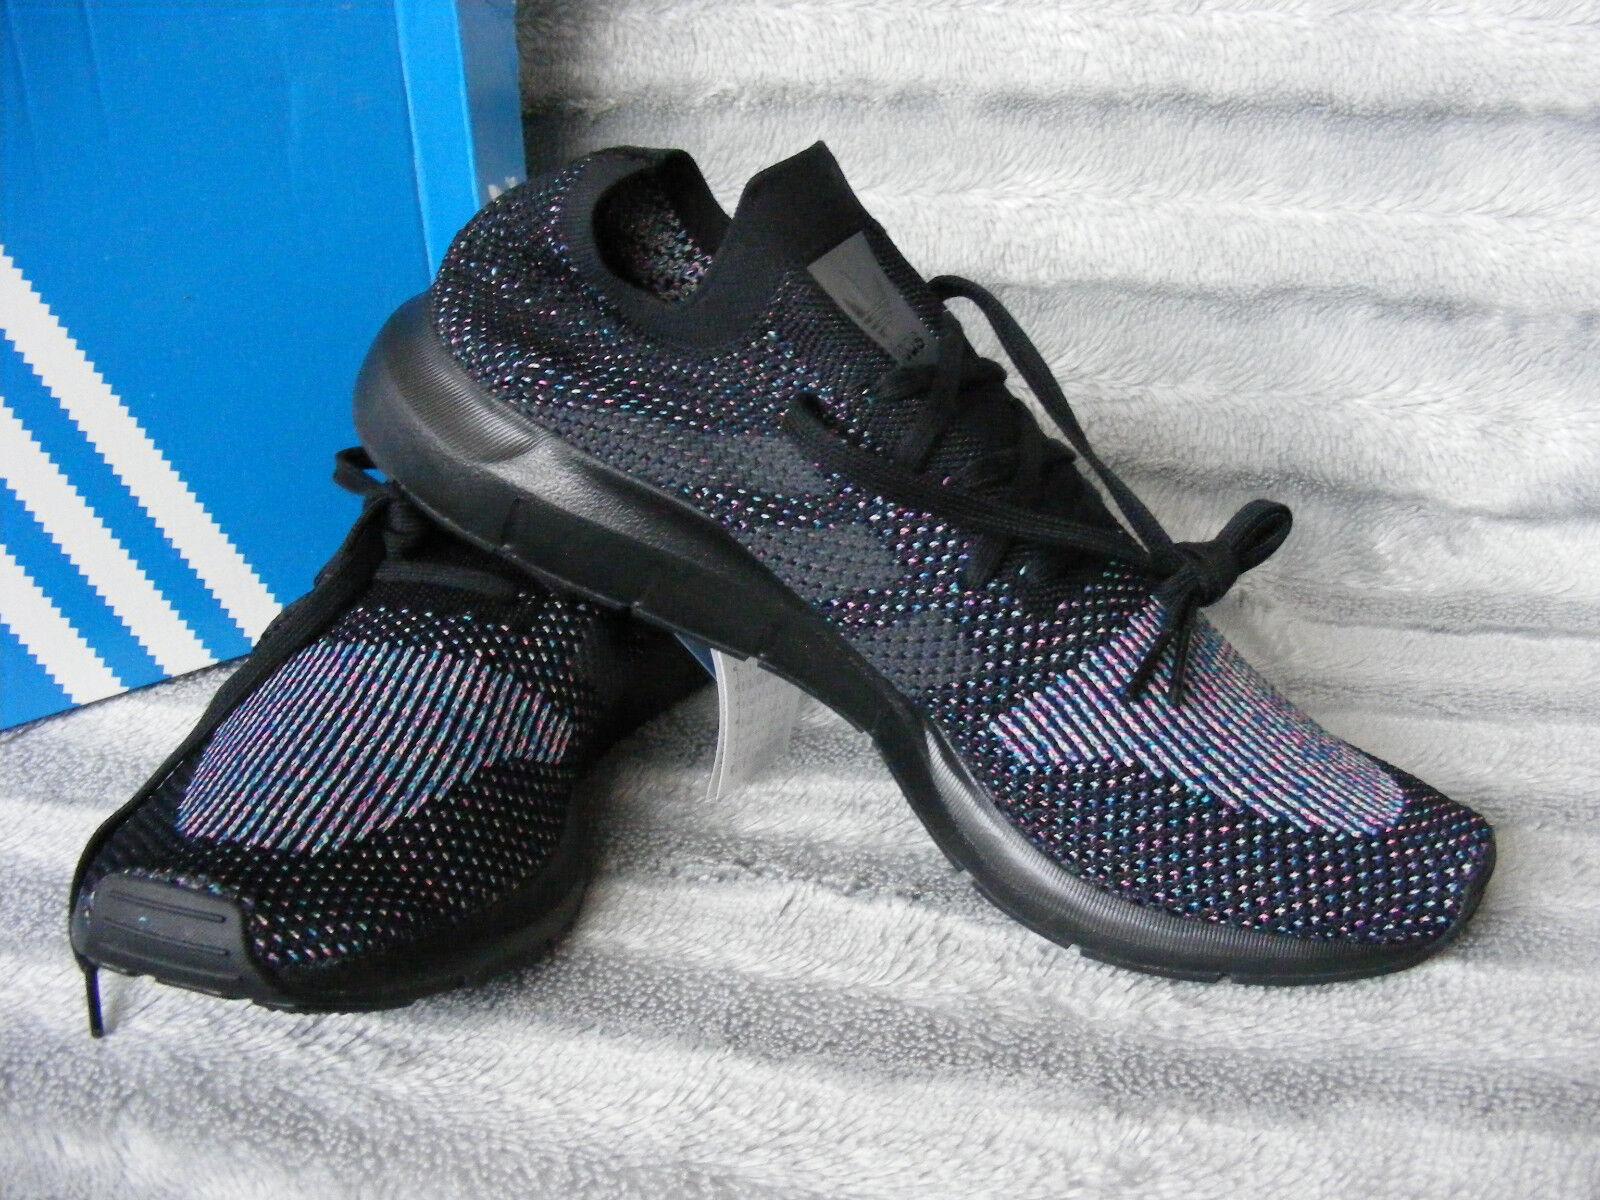 save off 77f2c 03038 Adidas Originals Swift Footwear courir homme Footwear Swift Chaussure -  Ftwwhtc noir greone